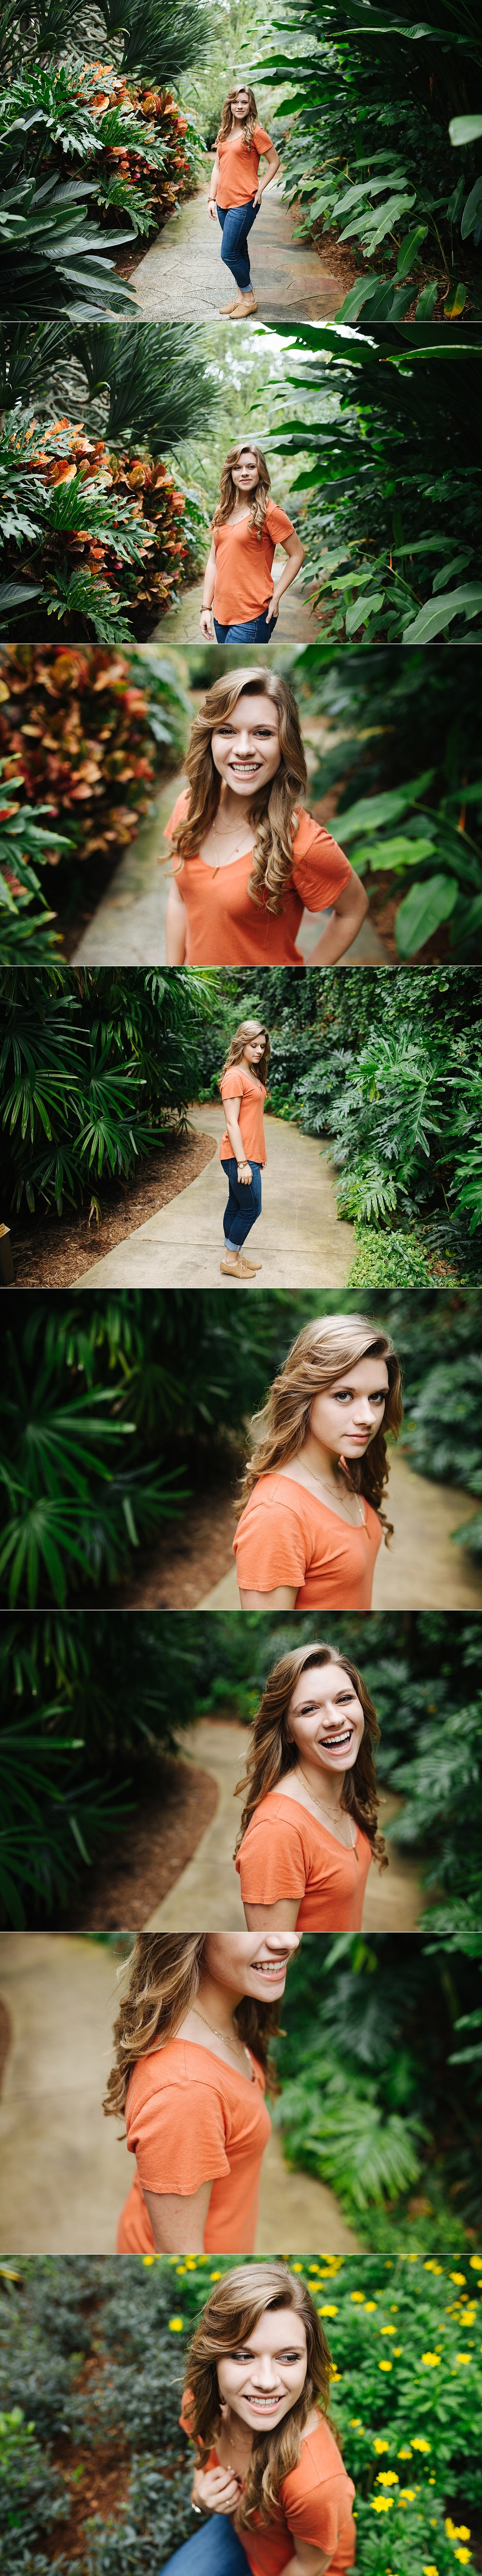 stpete senior portraits sunken gardens leah-8